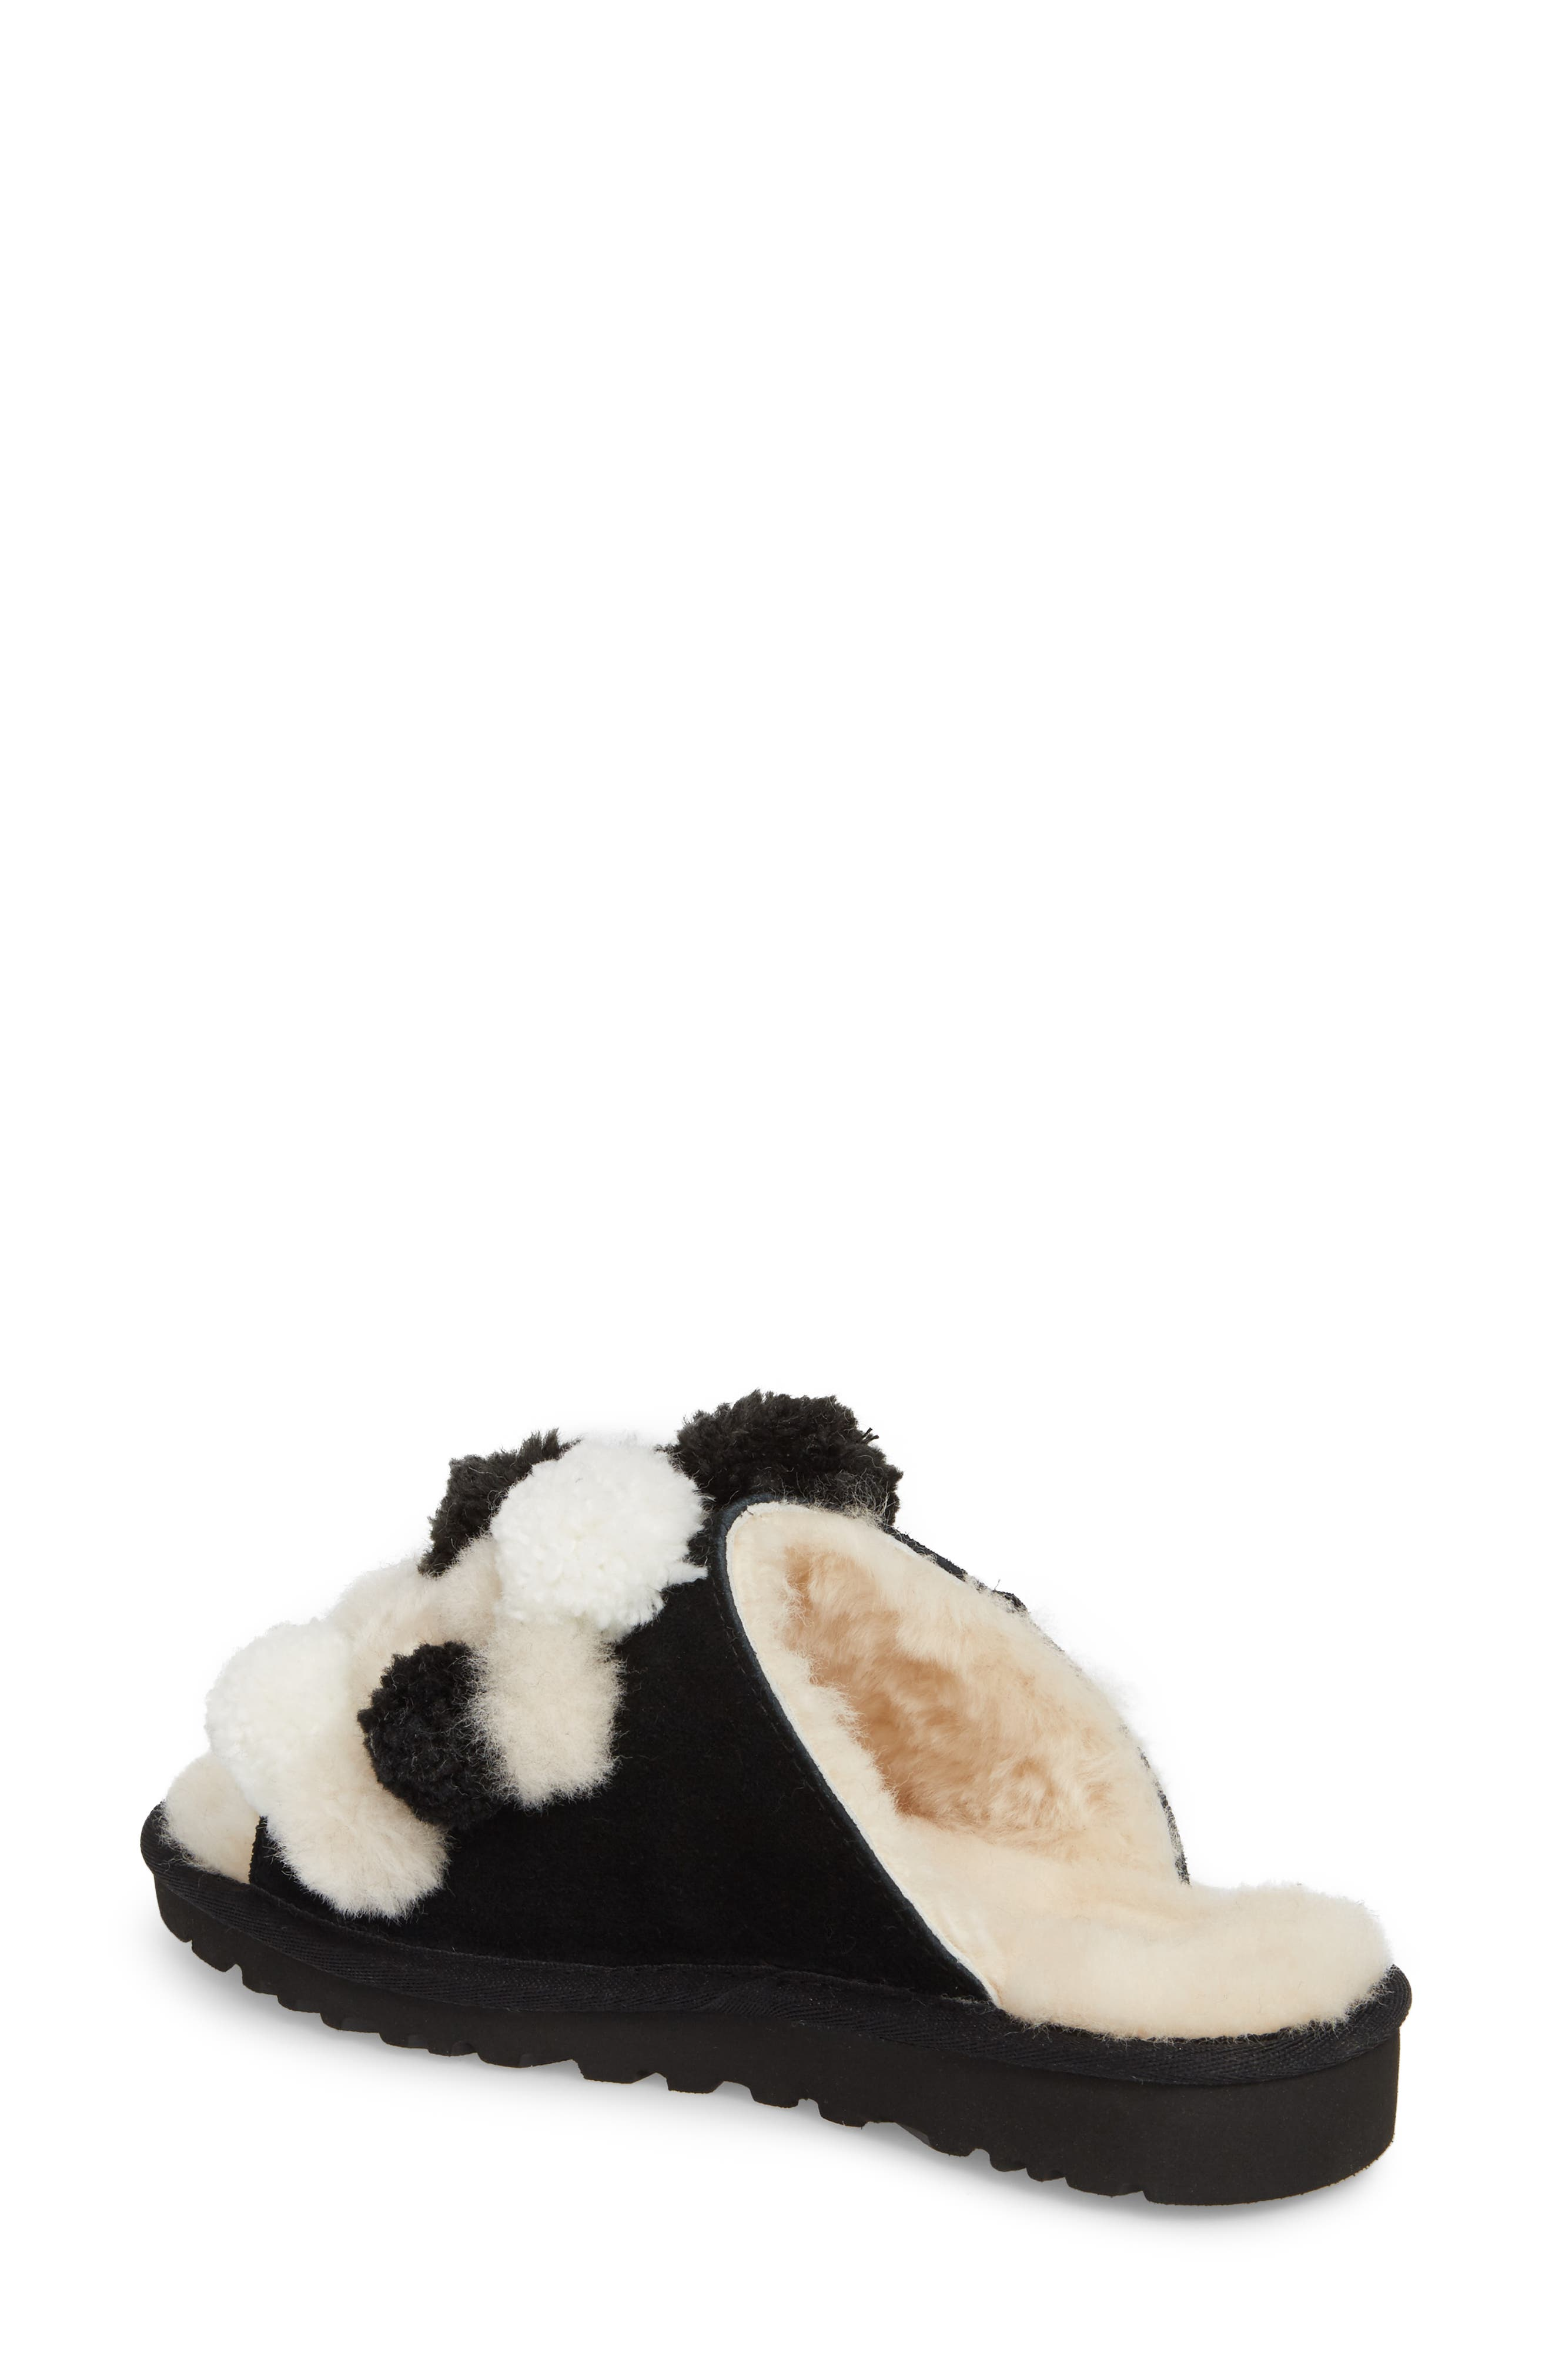 Clio Pom Pom Slide Sandal,                             Alternate thumbnail 2, color,                             Black Suede